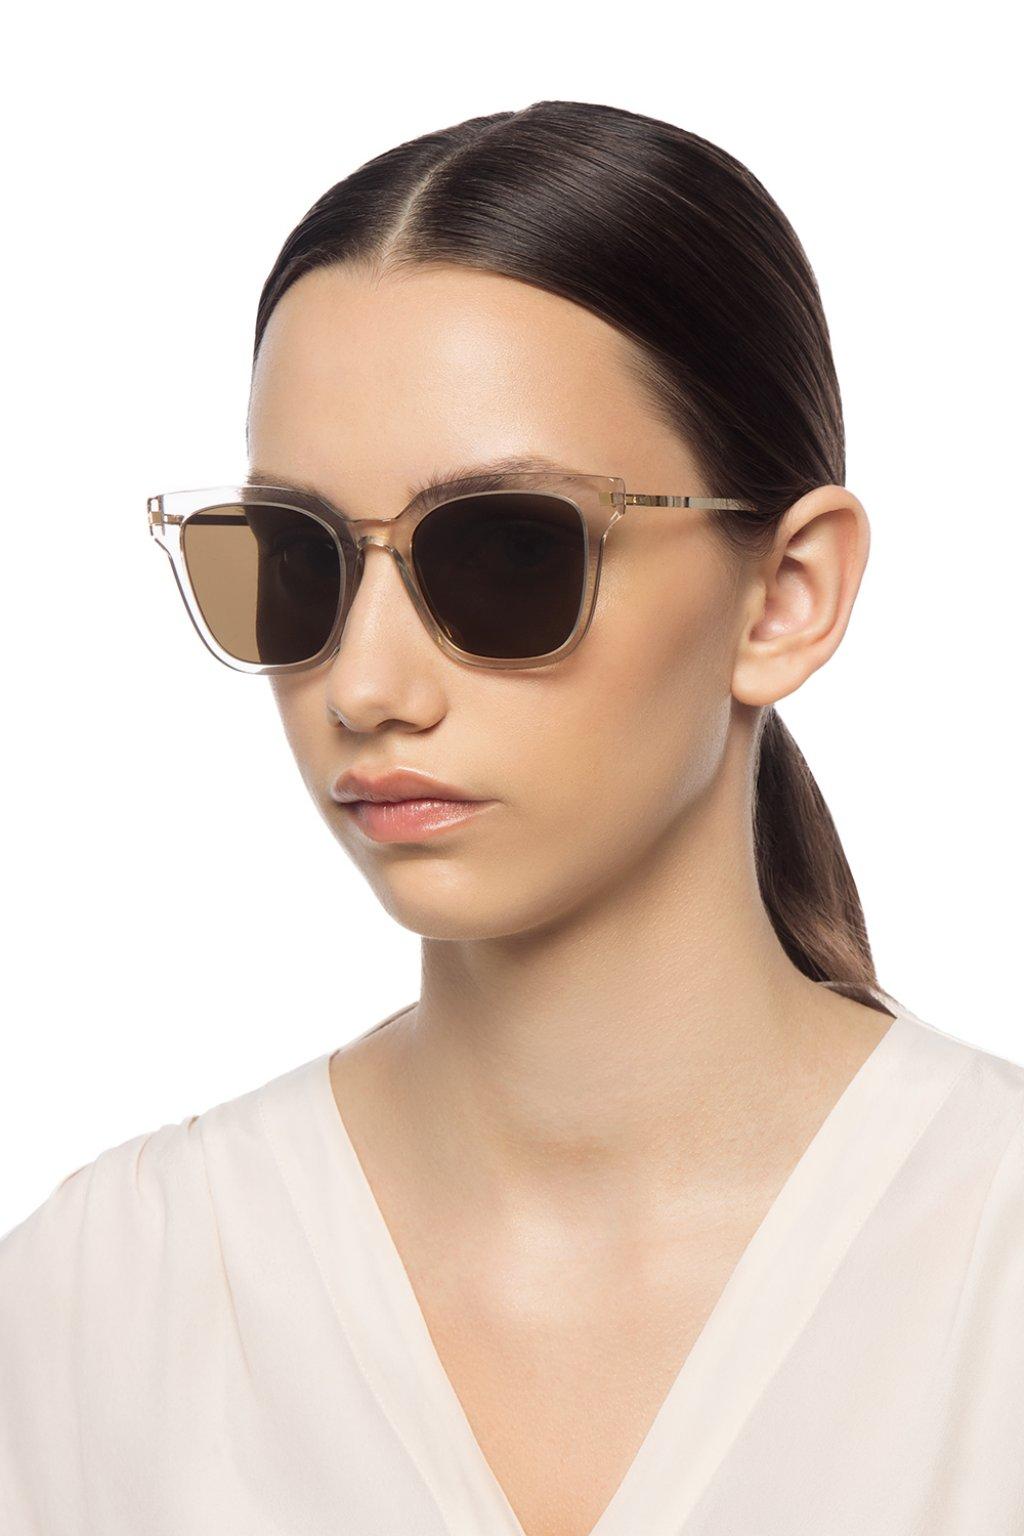 Mykita 'Yuka' sunglasses